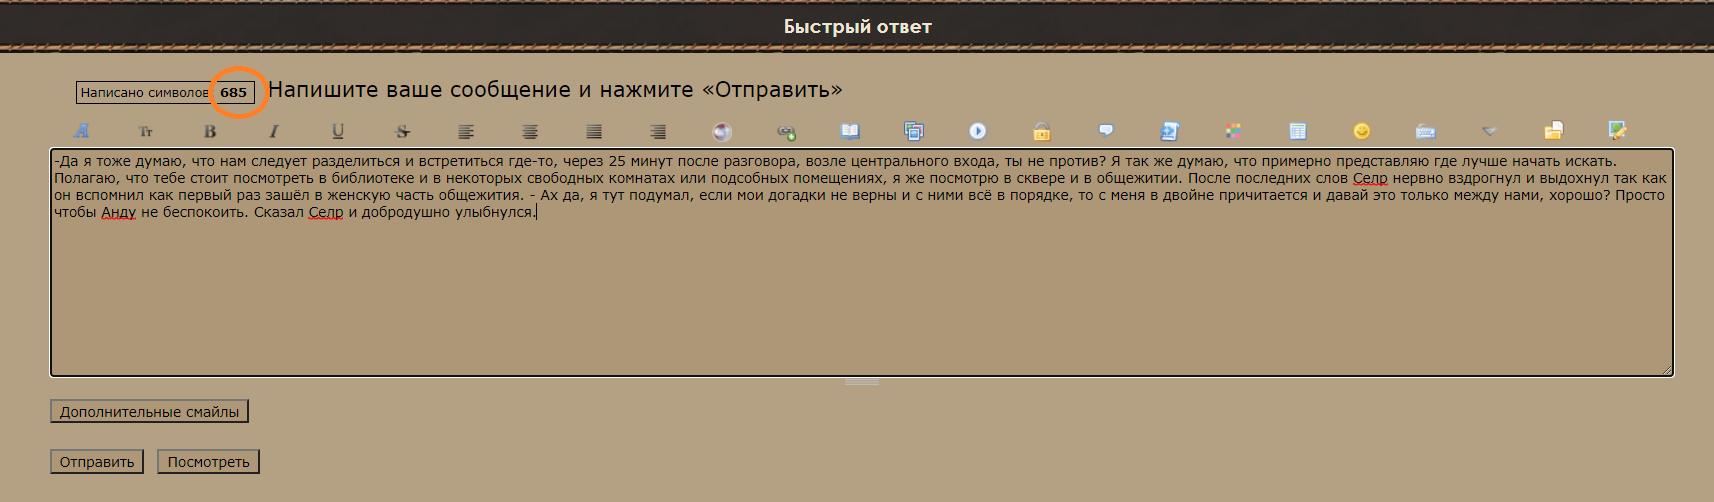 http://forumupload.ru/uploads/0001/52/10/522/207400.png